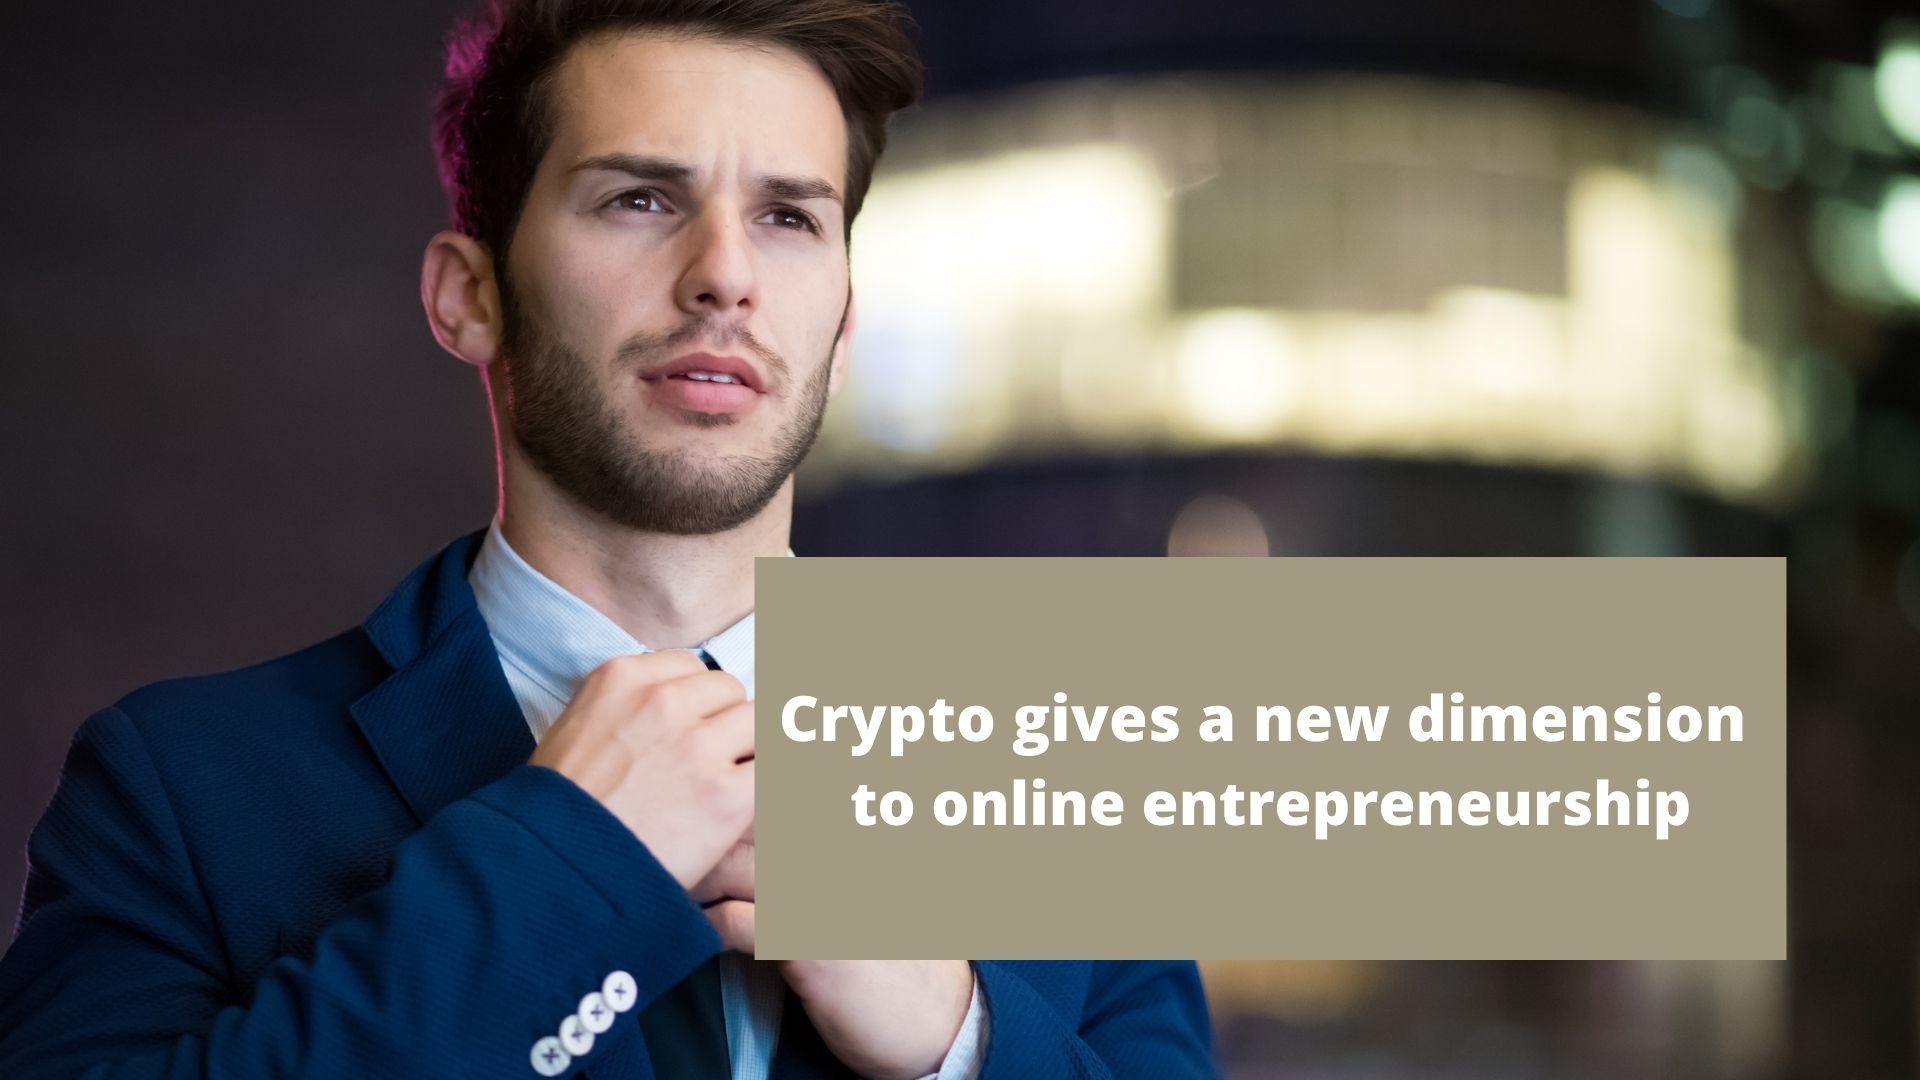 Crypto gives a new dimension to online entrepreneurship.jpg